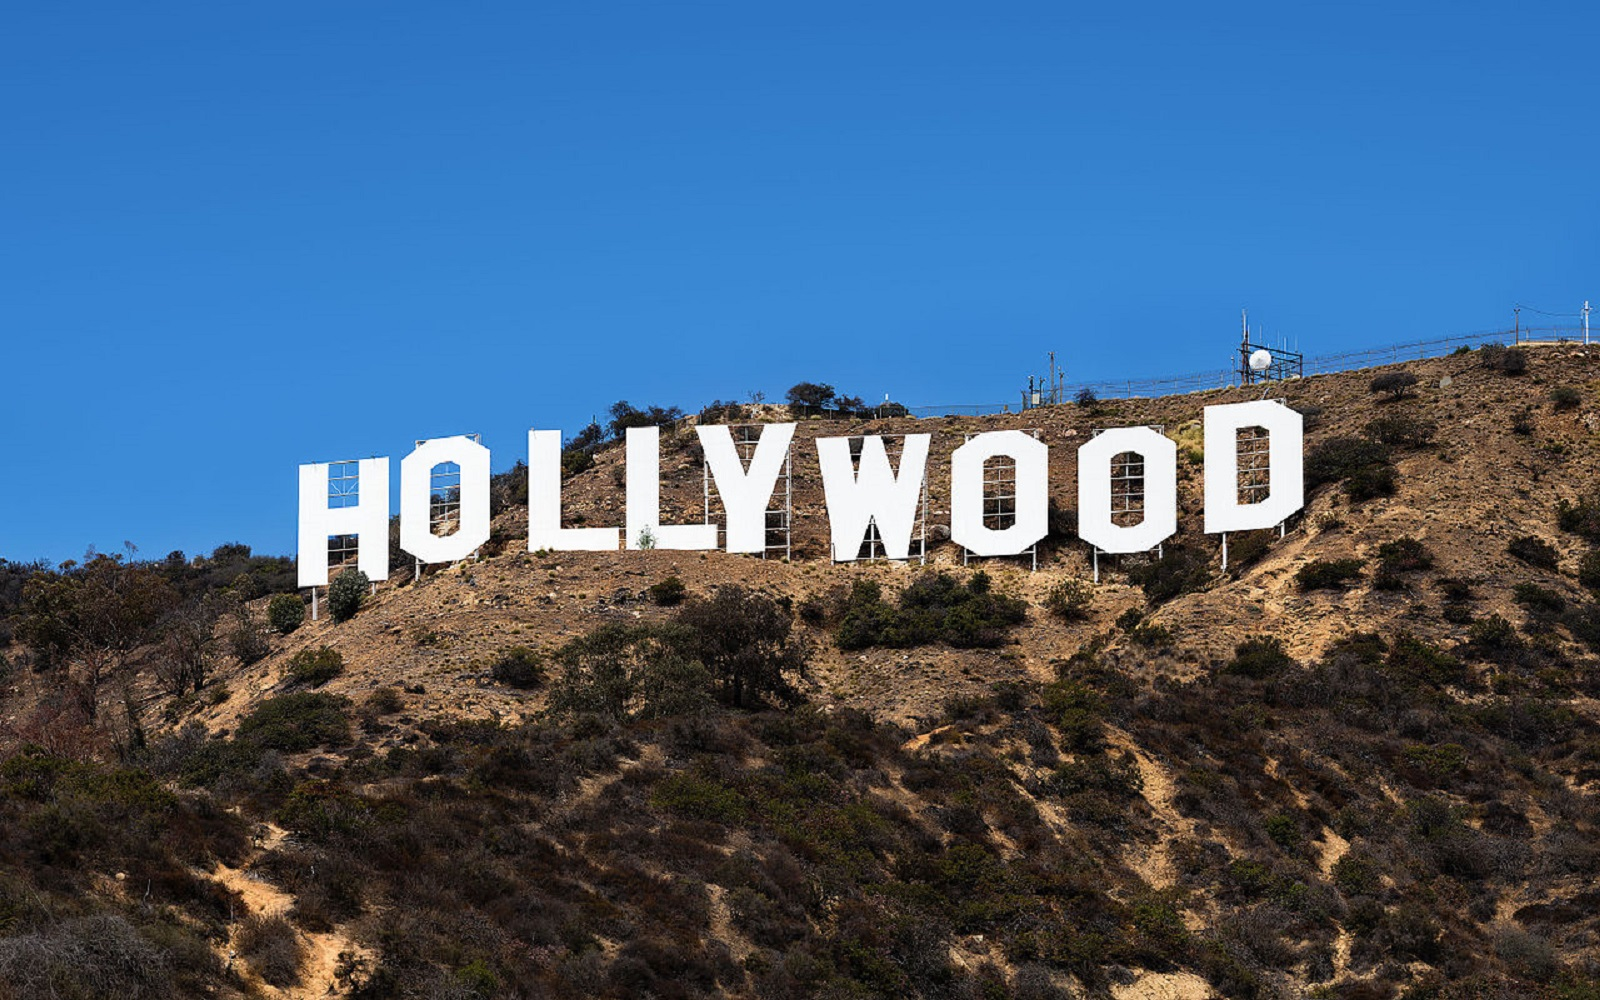 hollywood_sign_zuschnitt.jpg